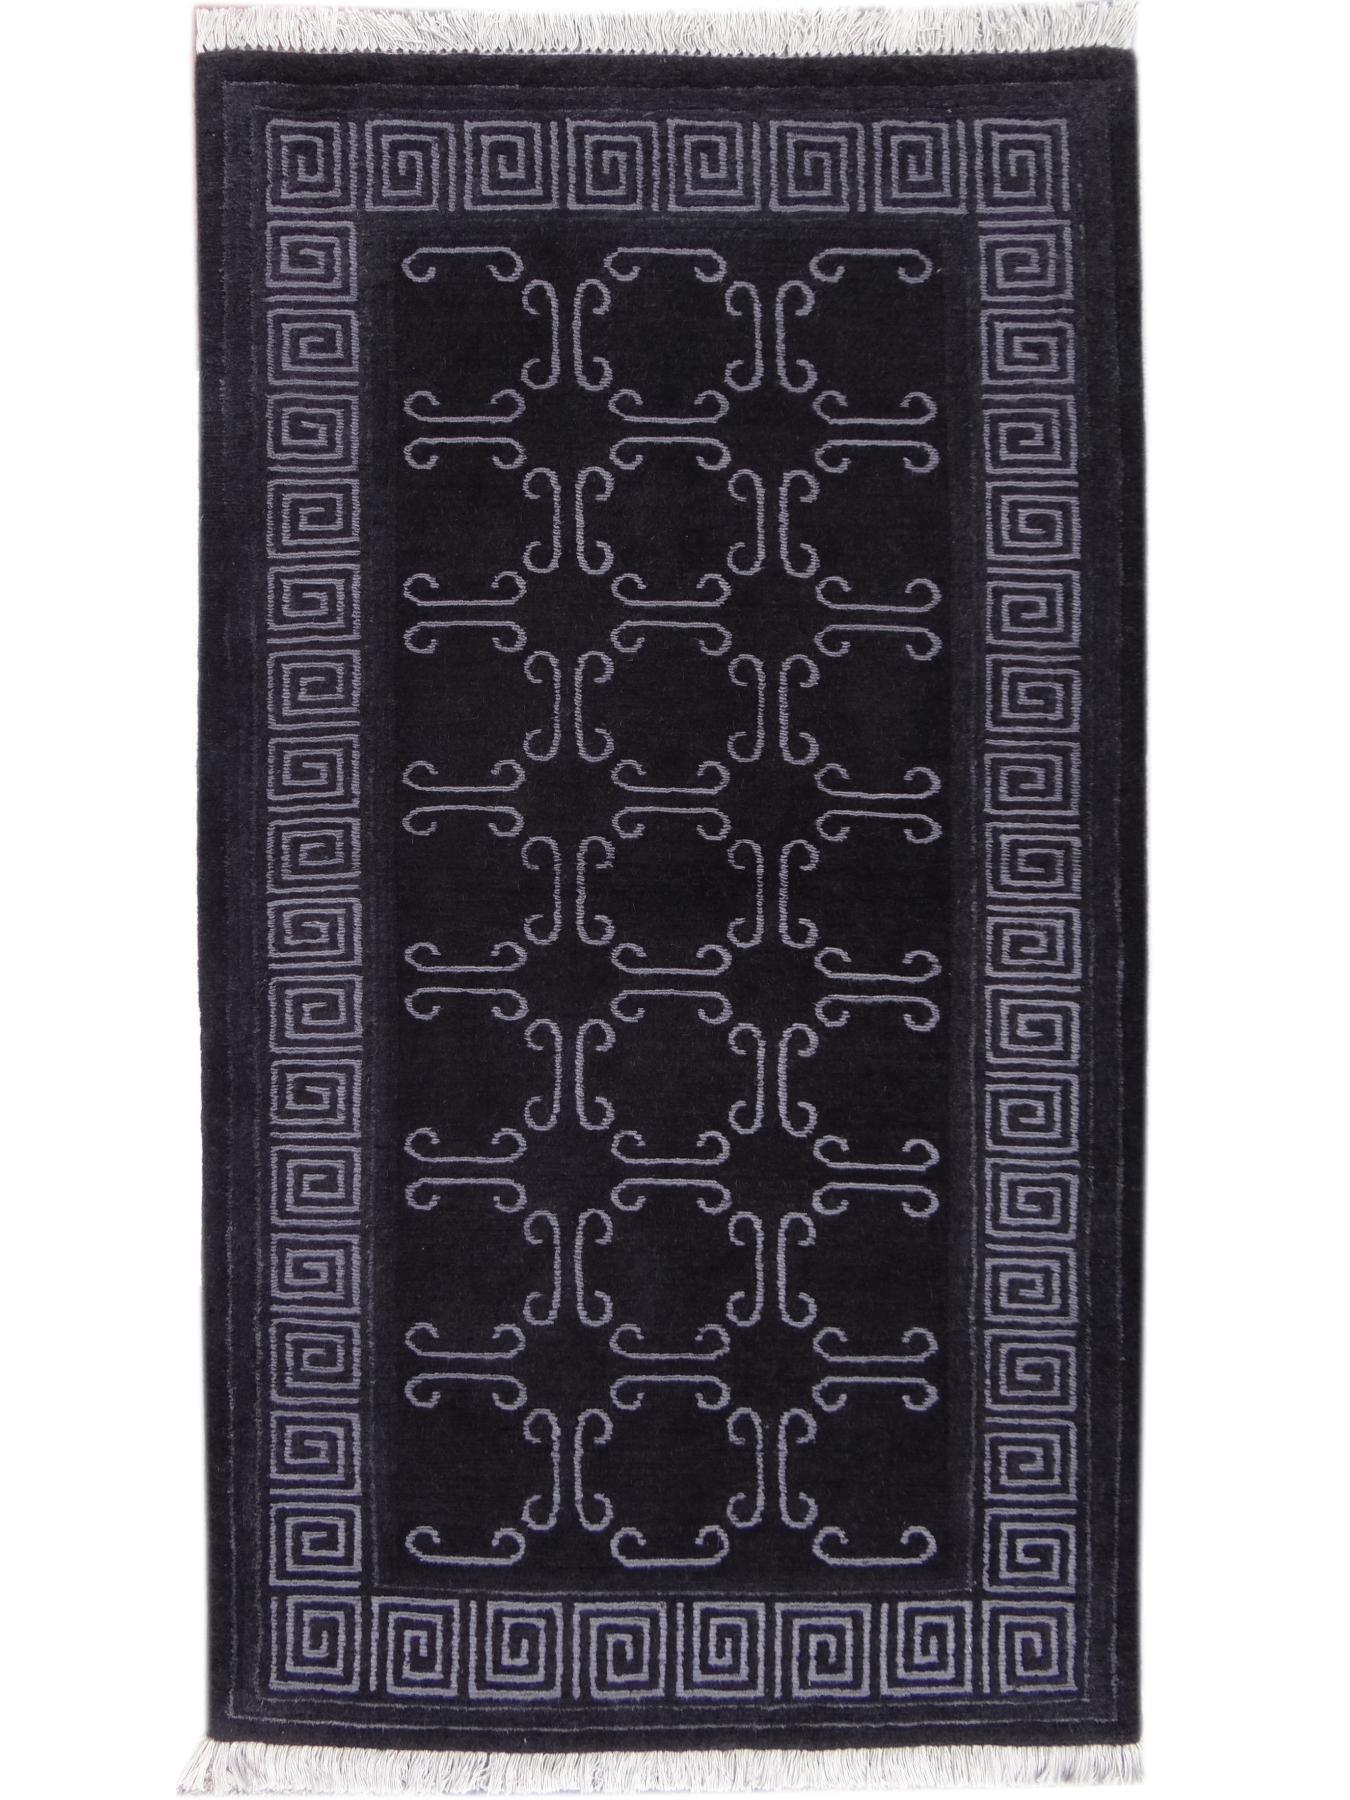 Luxury tapijten - GRECO - S5525 GREY